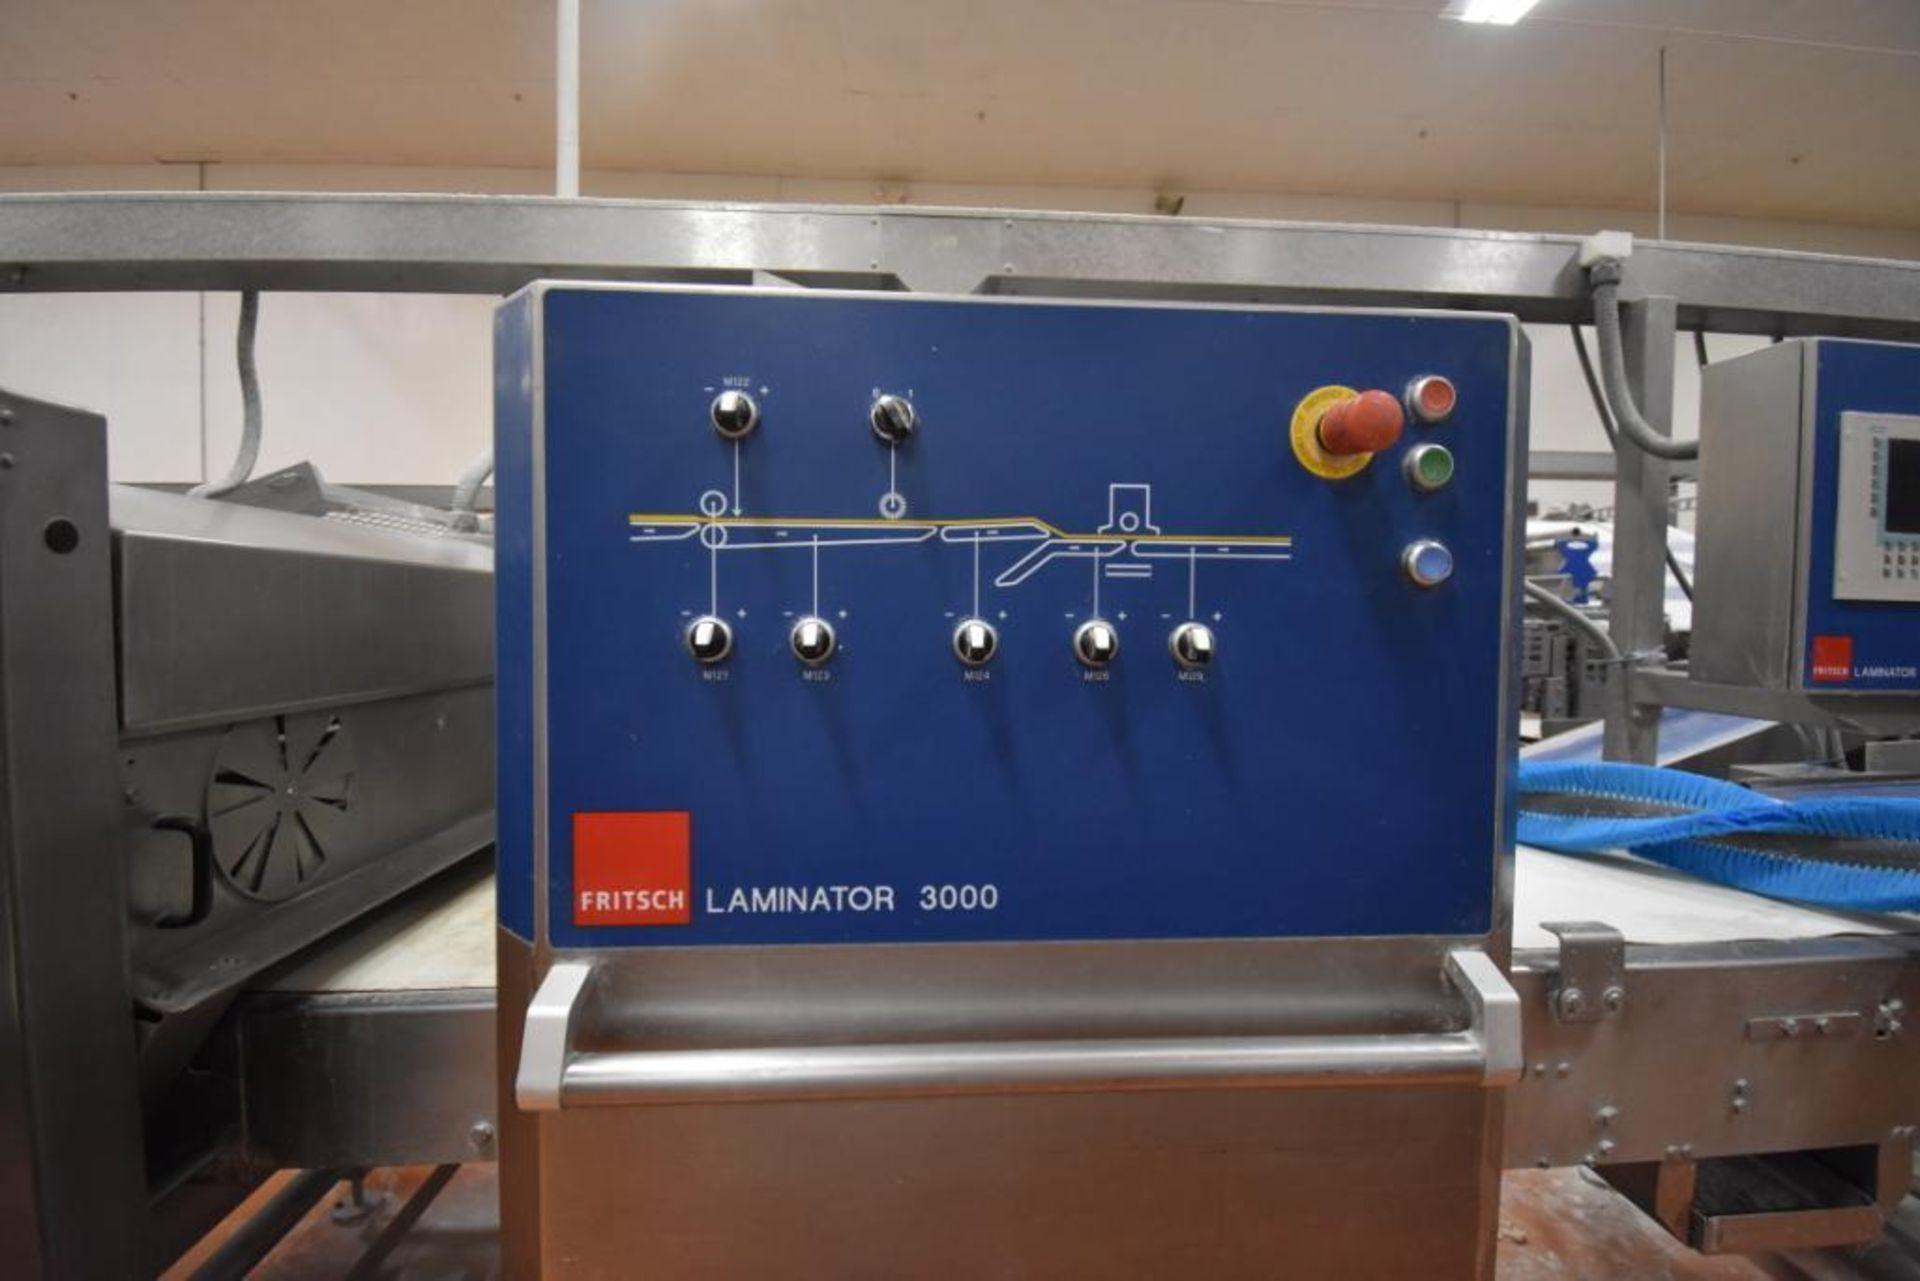 2007 Fritsch Laminator 3000 dough line - Image 73 of 280